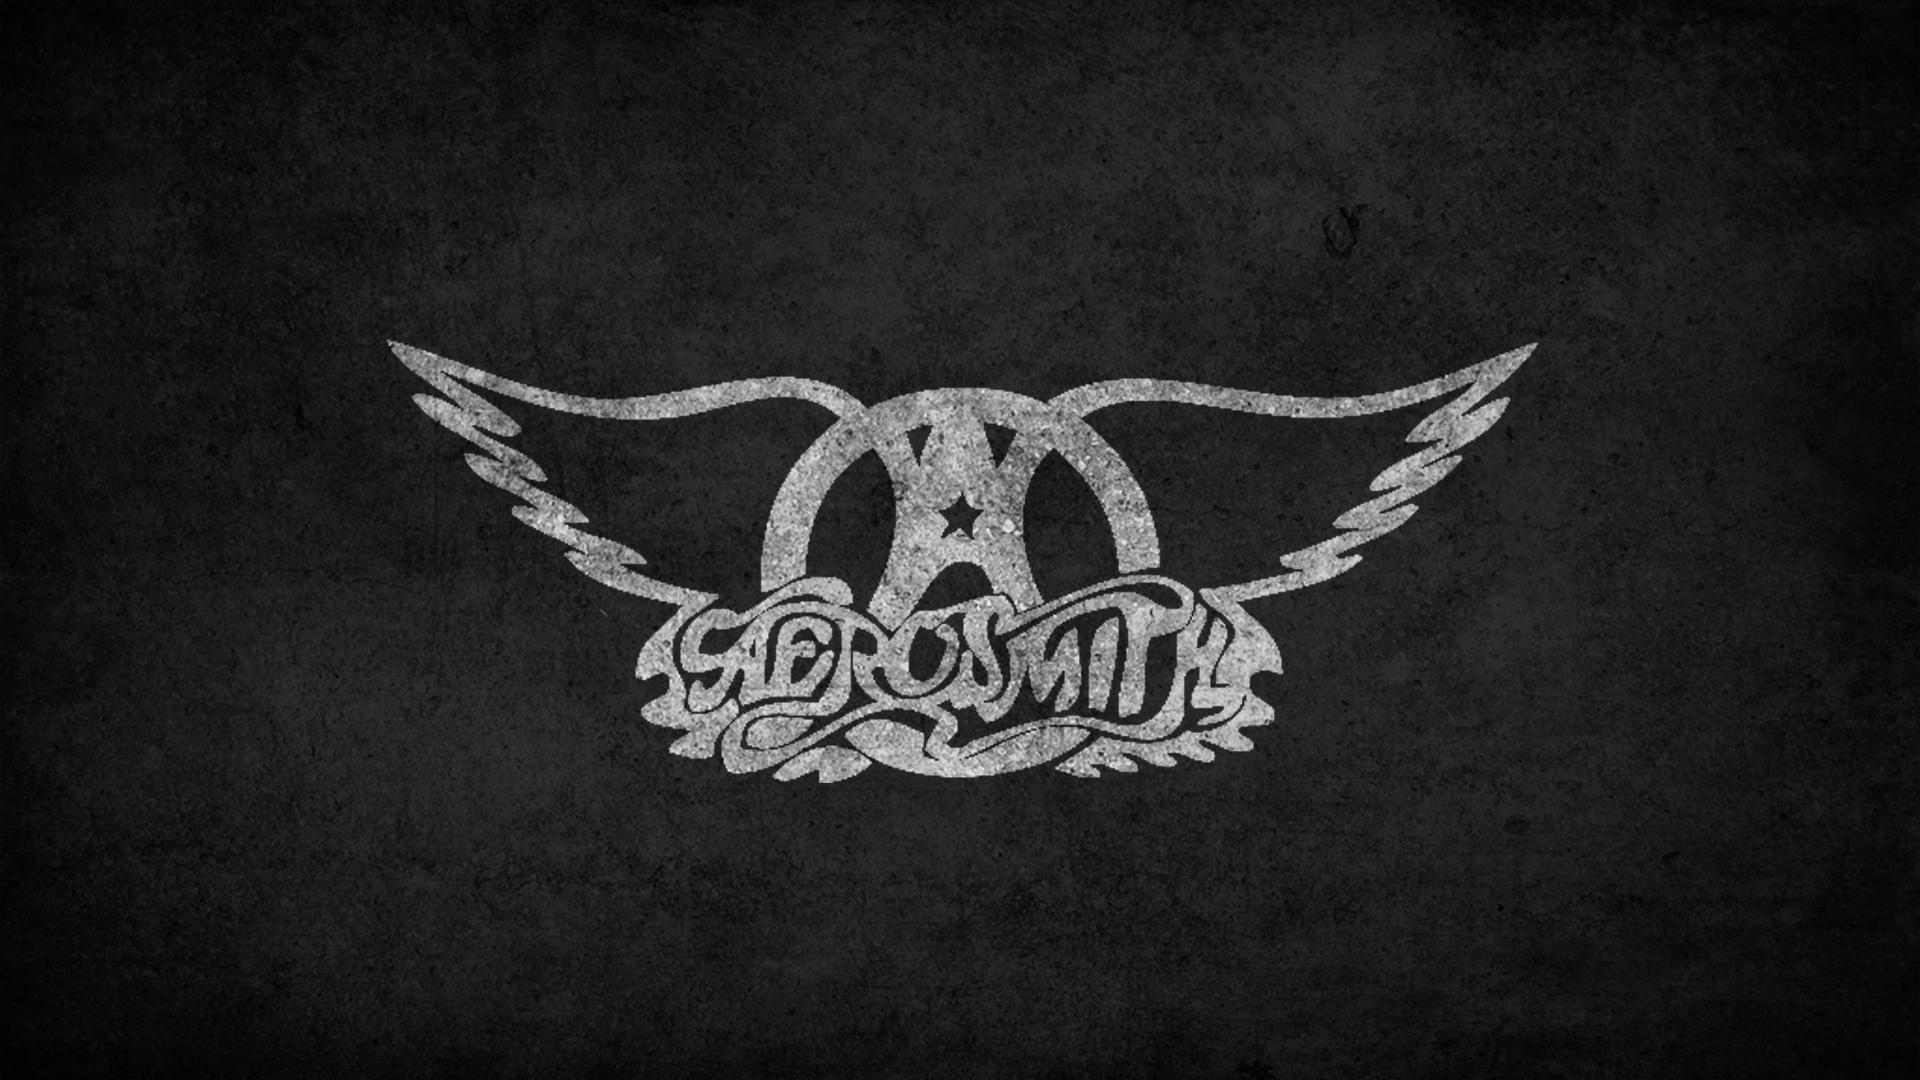 Aerosmith Fond Décran Hd Arrière Plan 1920x1080 Id634101